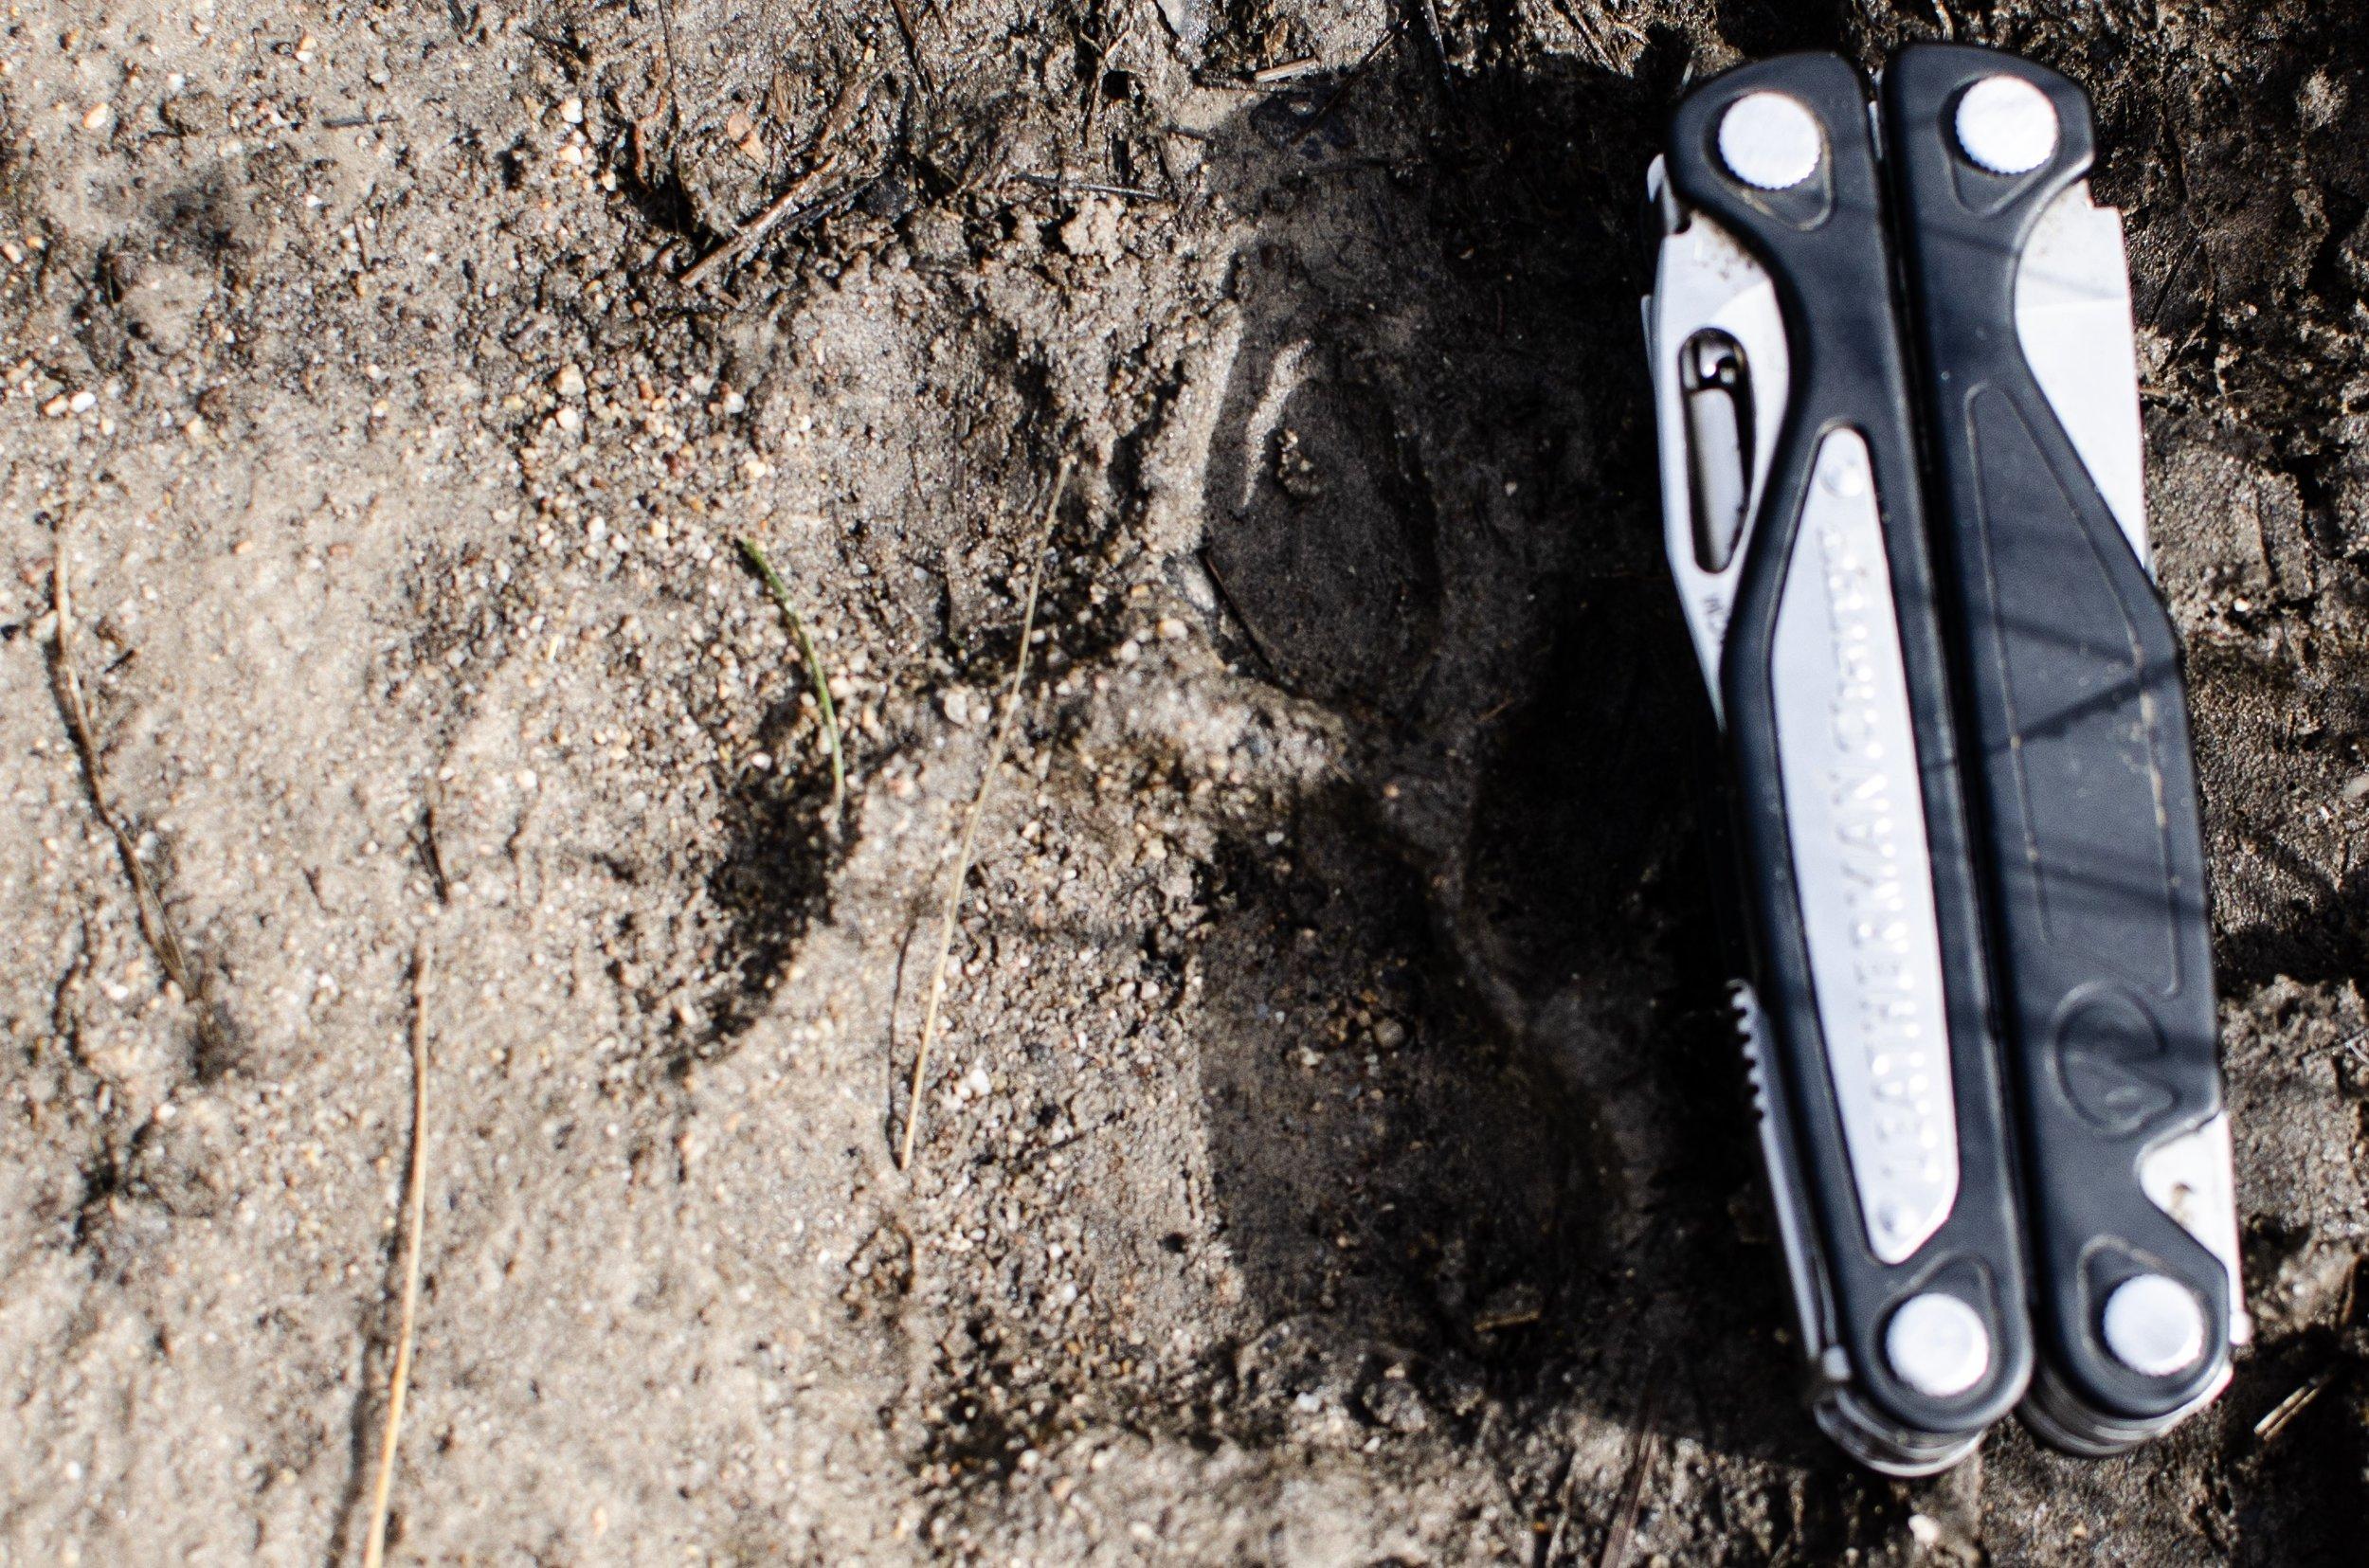 Jaguar footprint in the mud near my hammock.